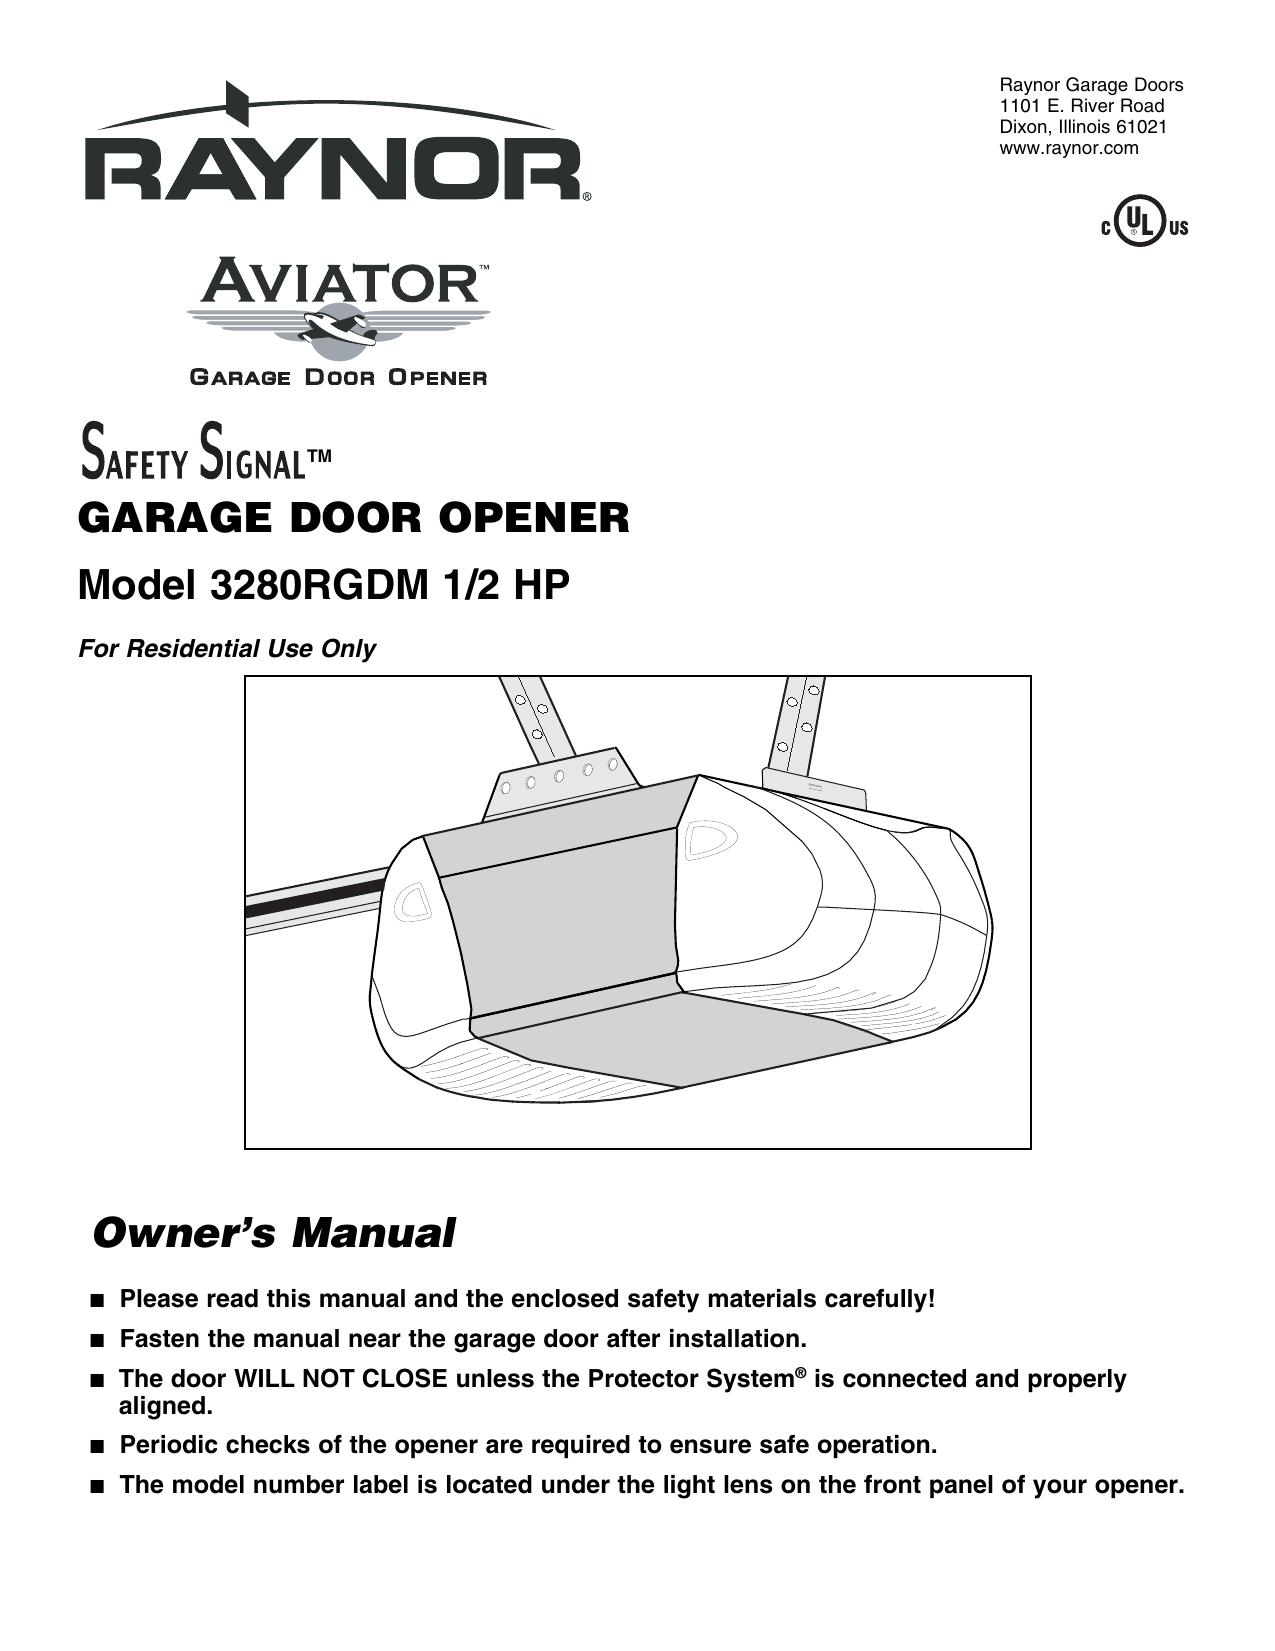 039319645_1-53e613151560b70431c47e4108e8178c Raynor Garage Door Opener Wiring Diagram on